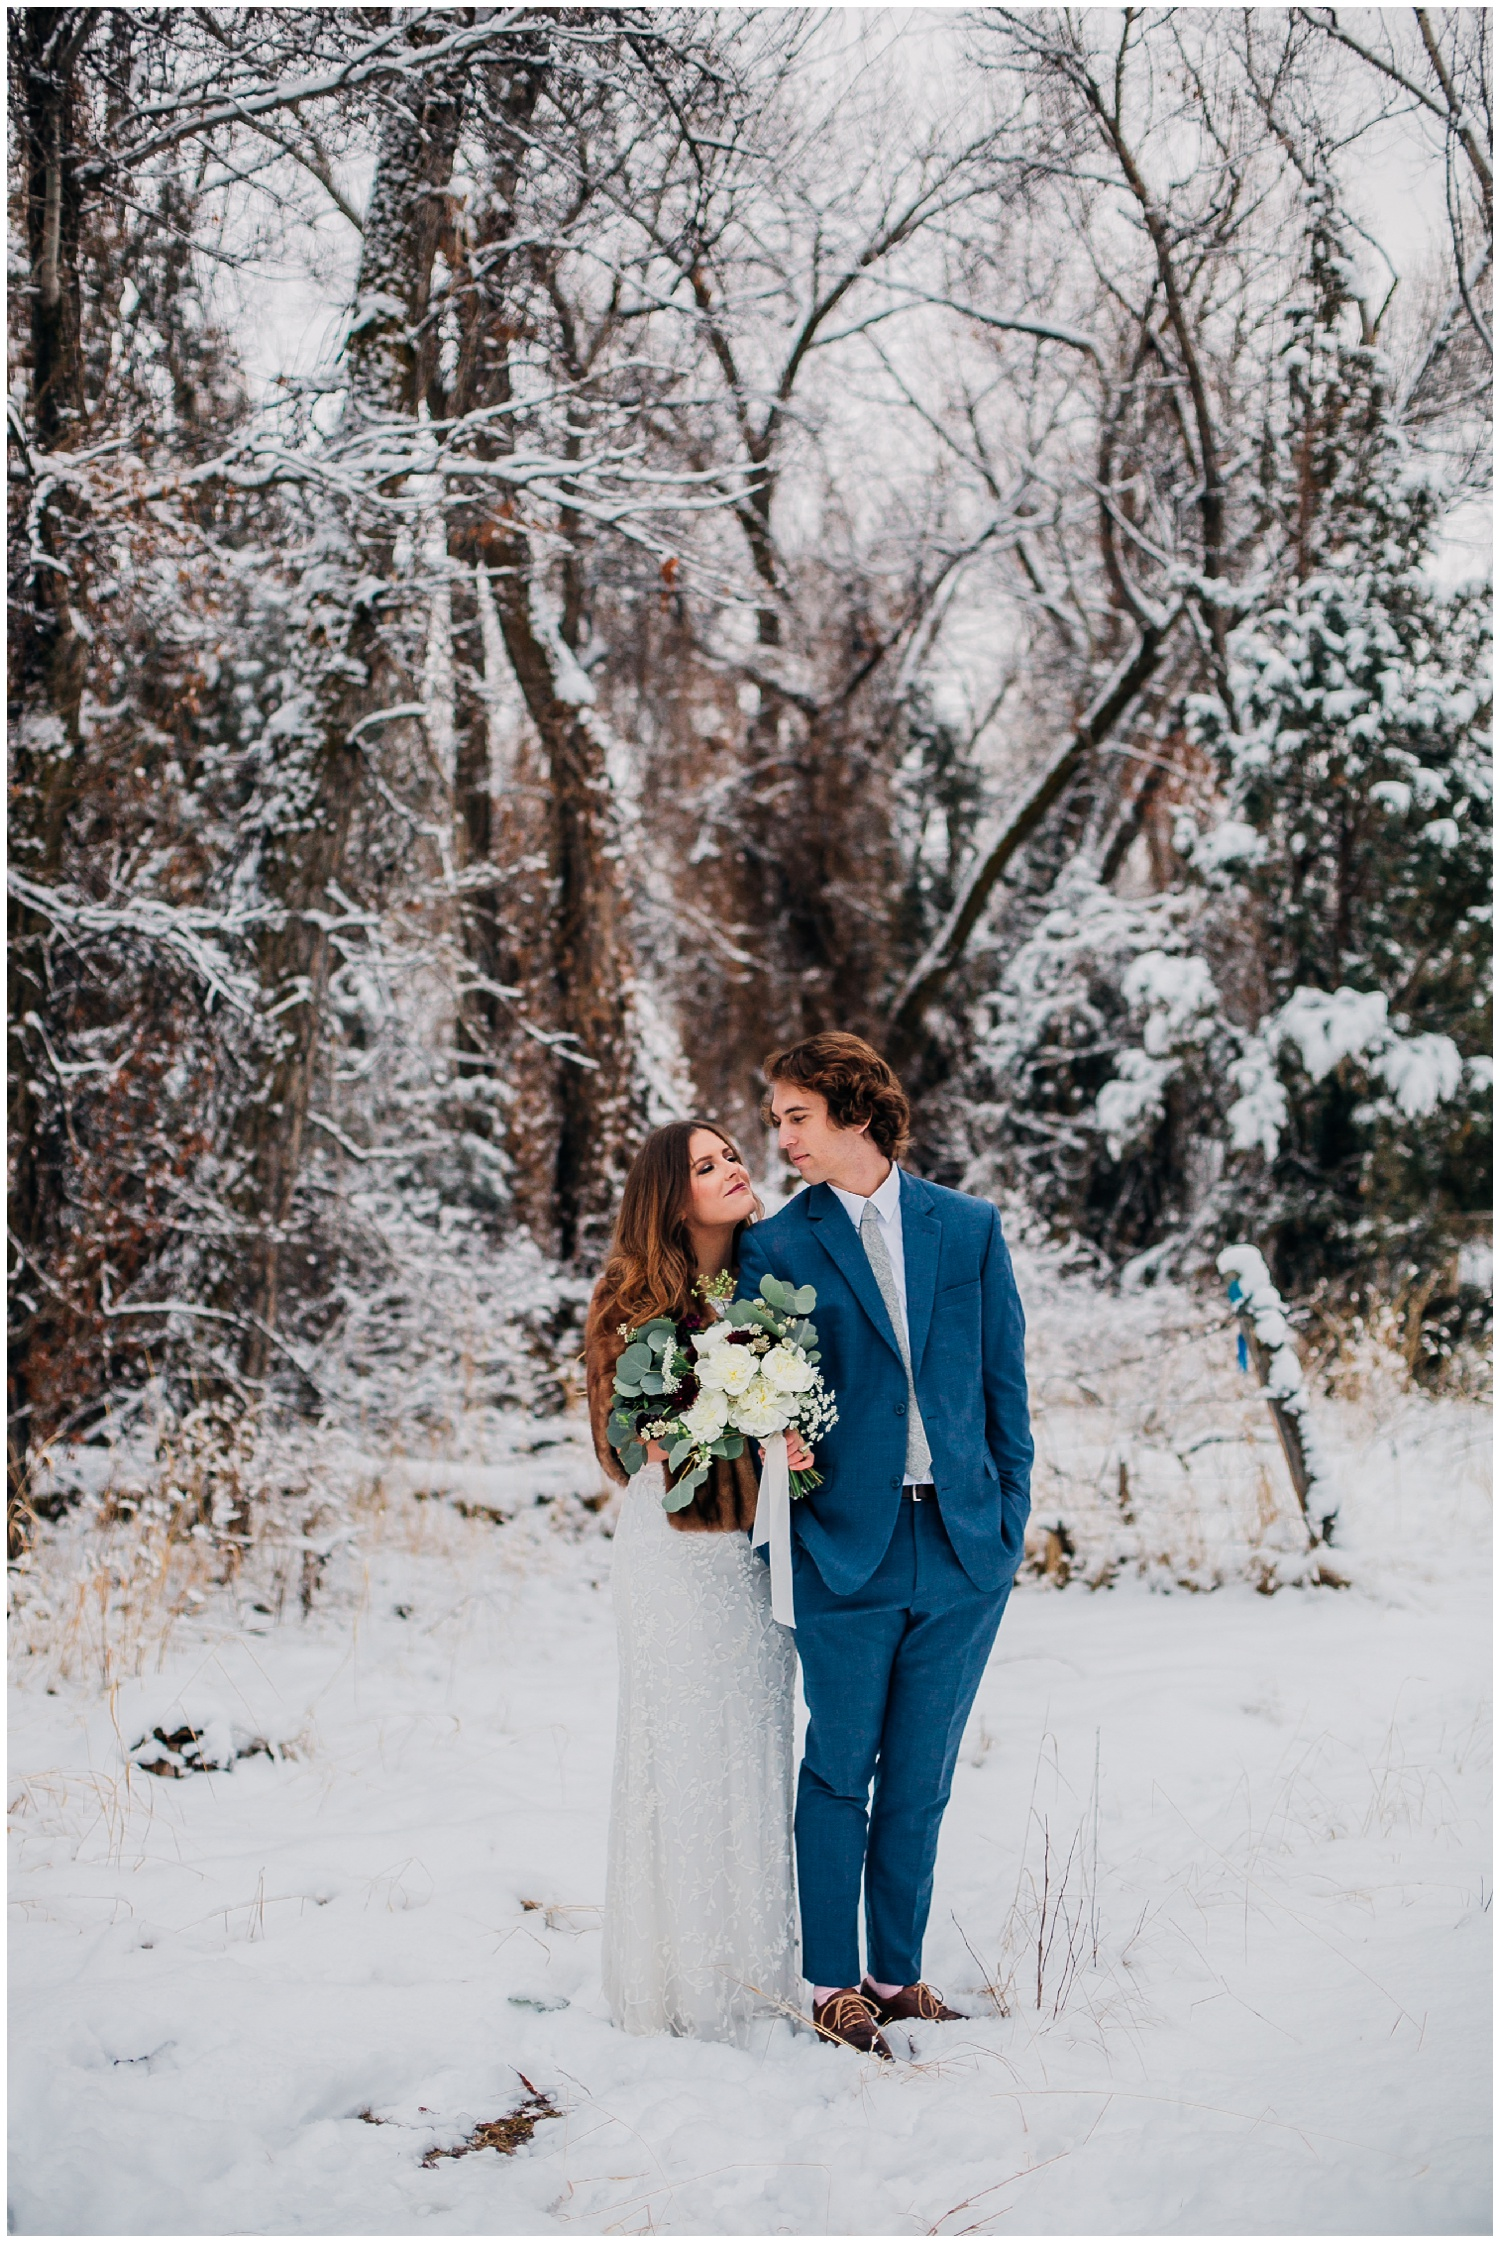 idaho+rexburg+wedding+cheyenne+wyoming+colorado+rocky+mountain+national+park+estes+park+engagement+wedding_1833.jpg